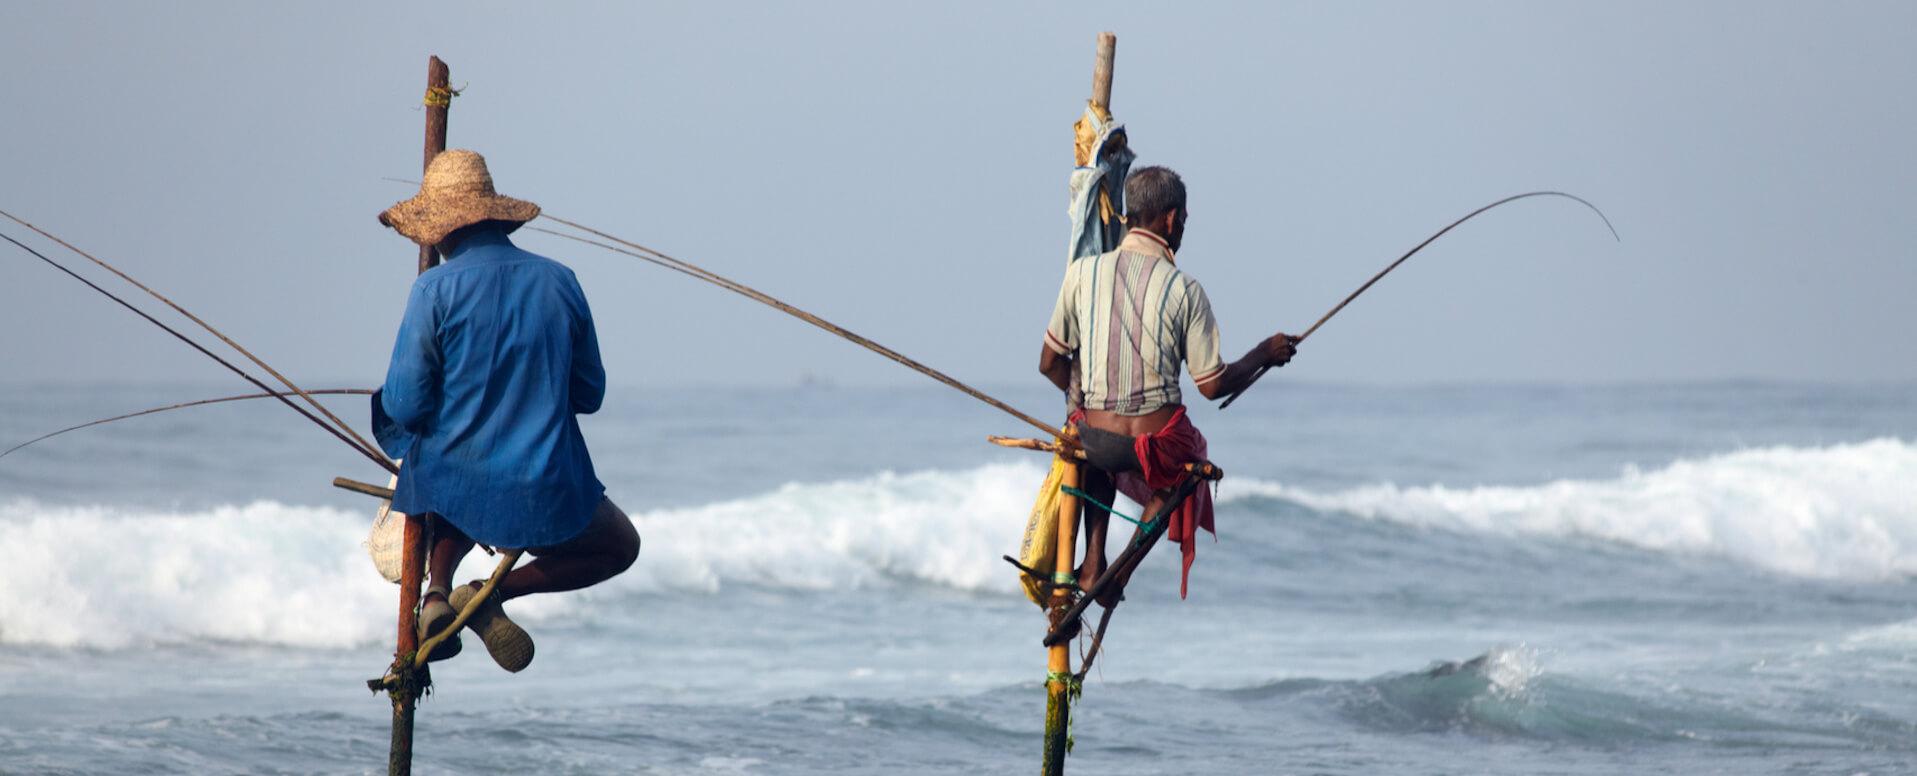 La pêche à Ahangama - Sri Lanka